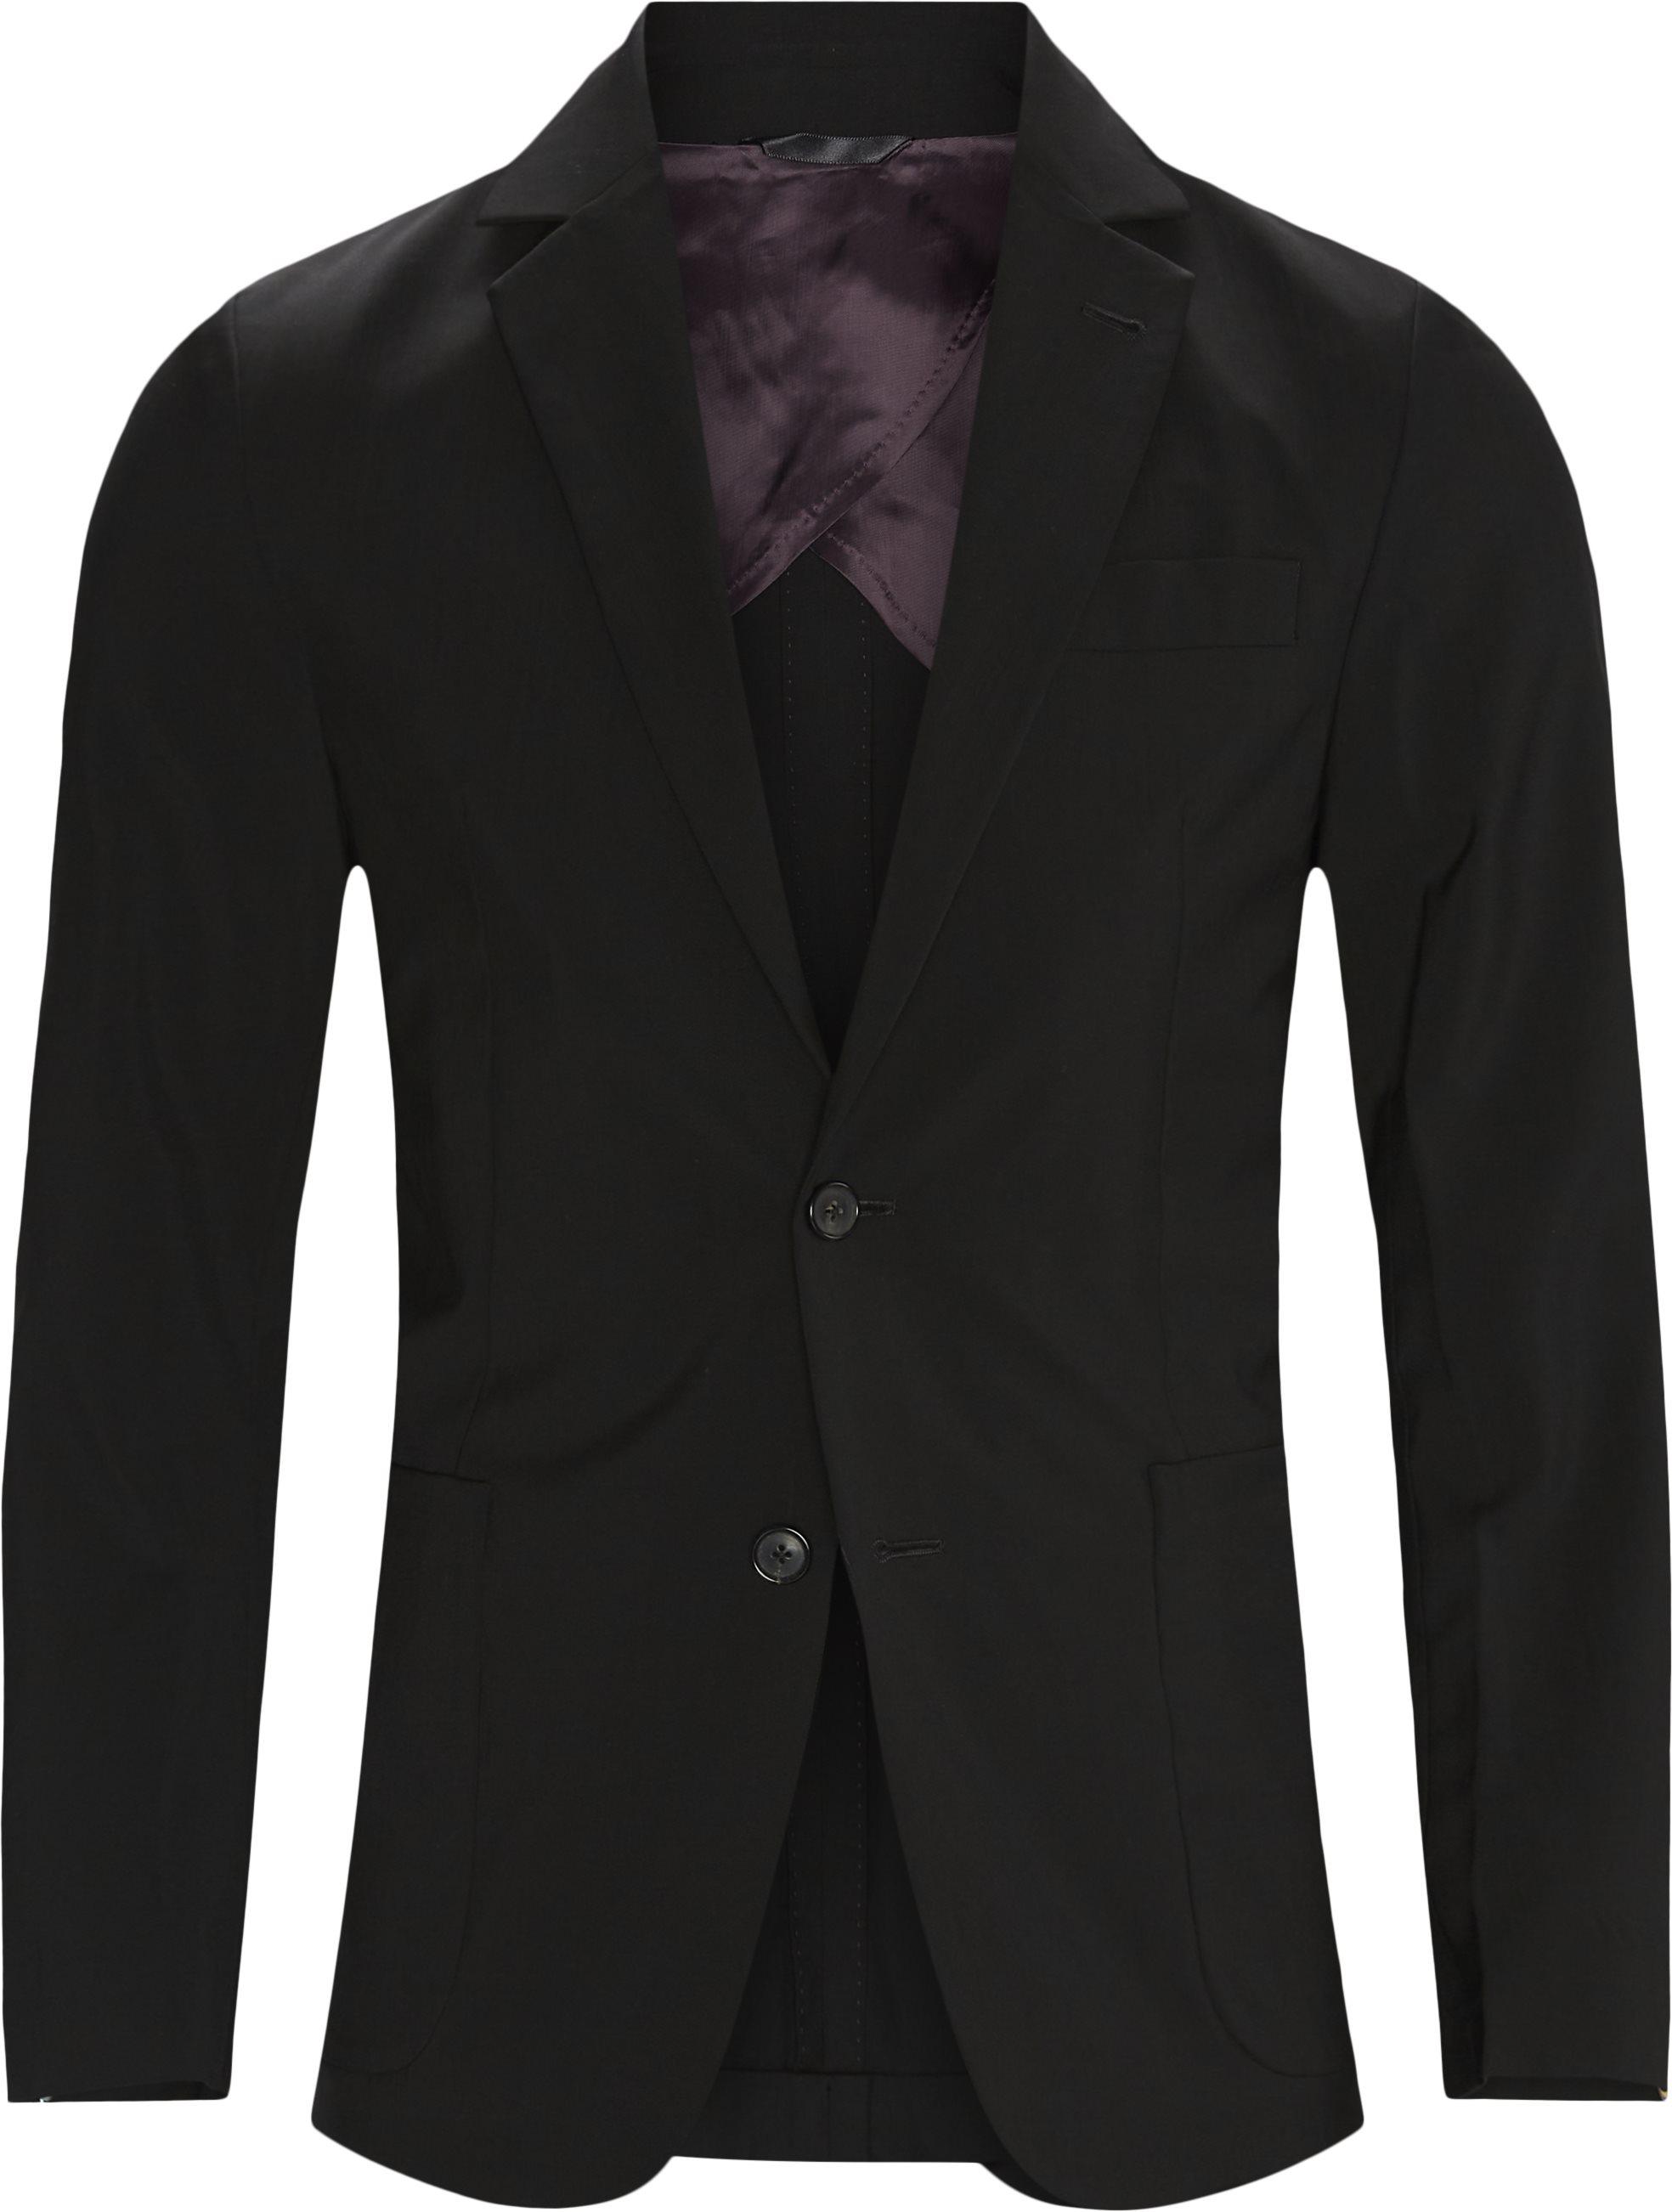 Blazers - Slim fit - Black